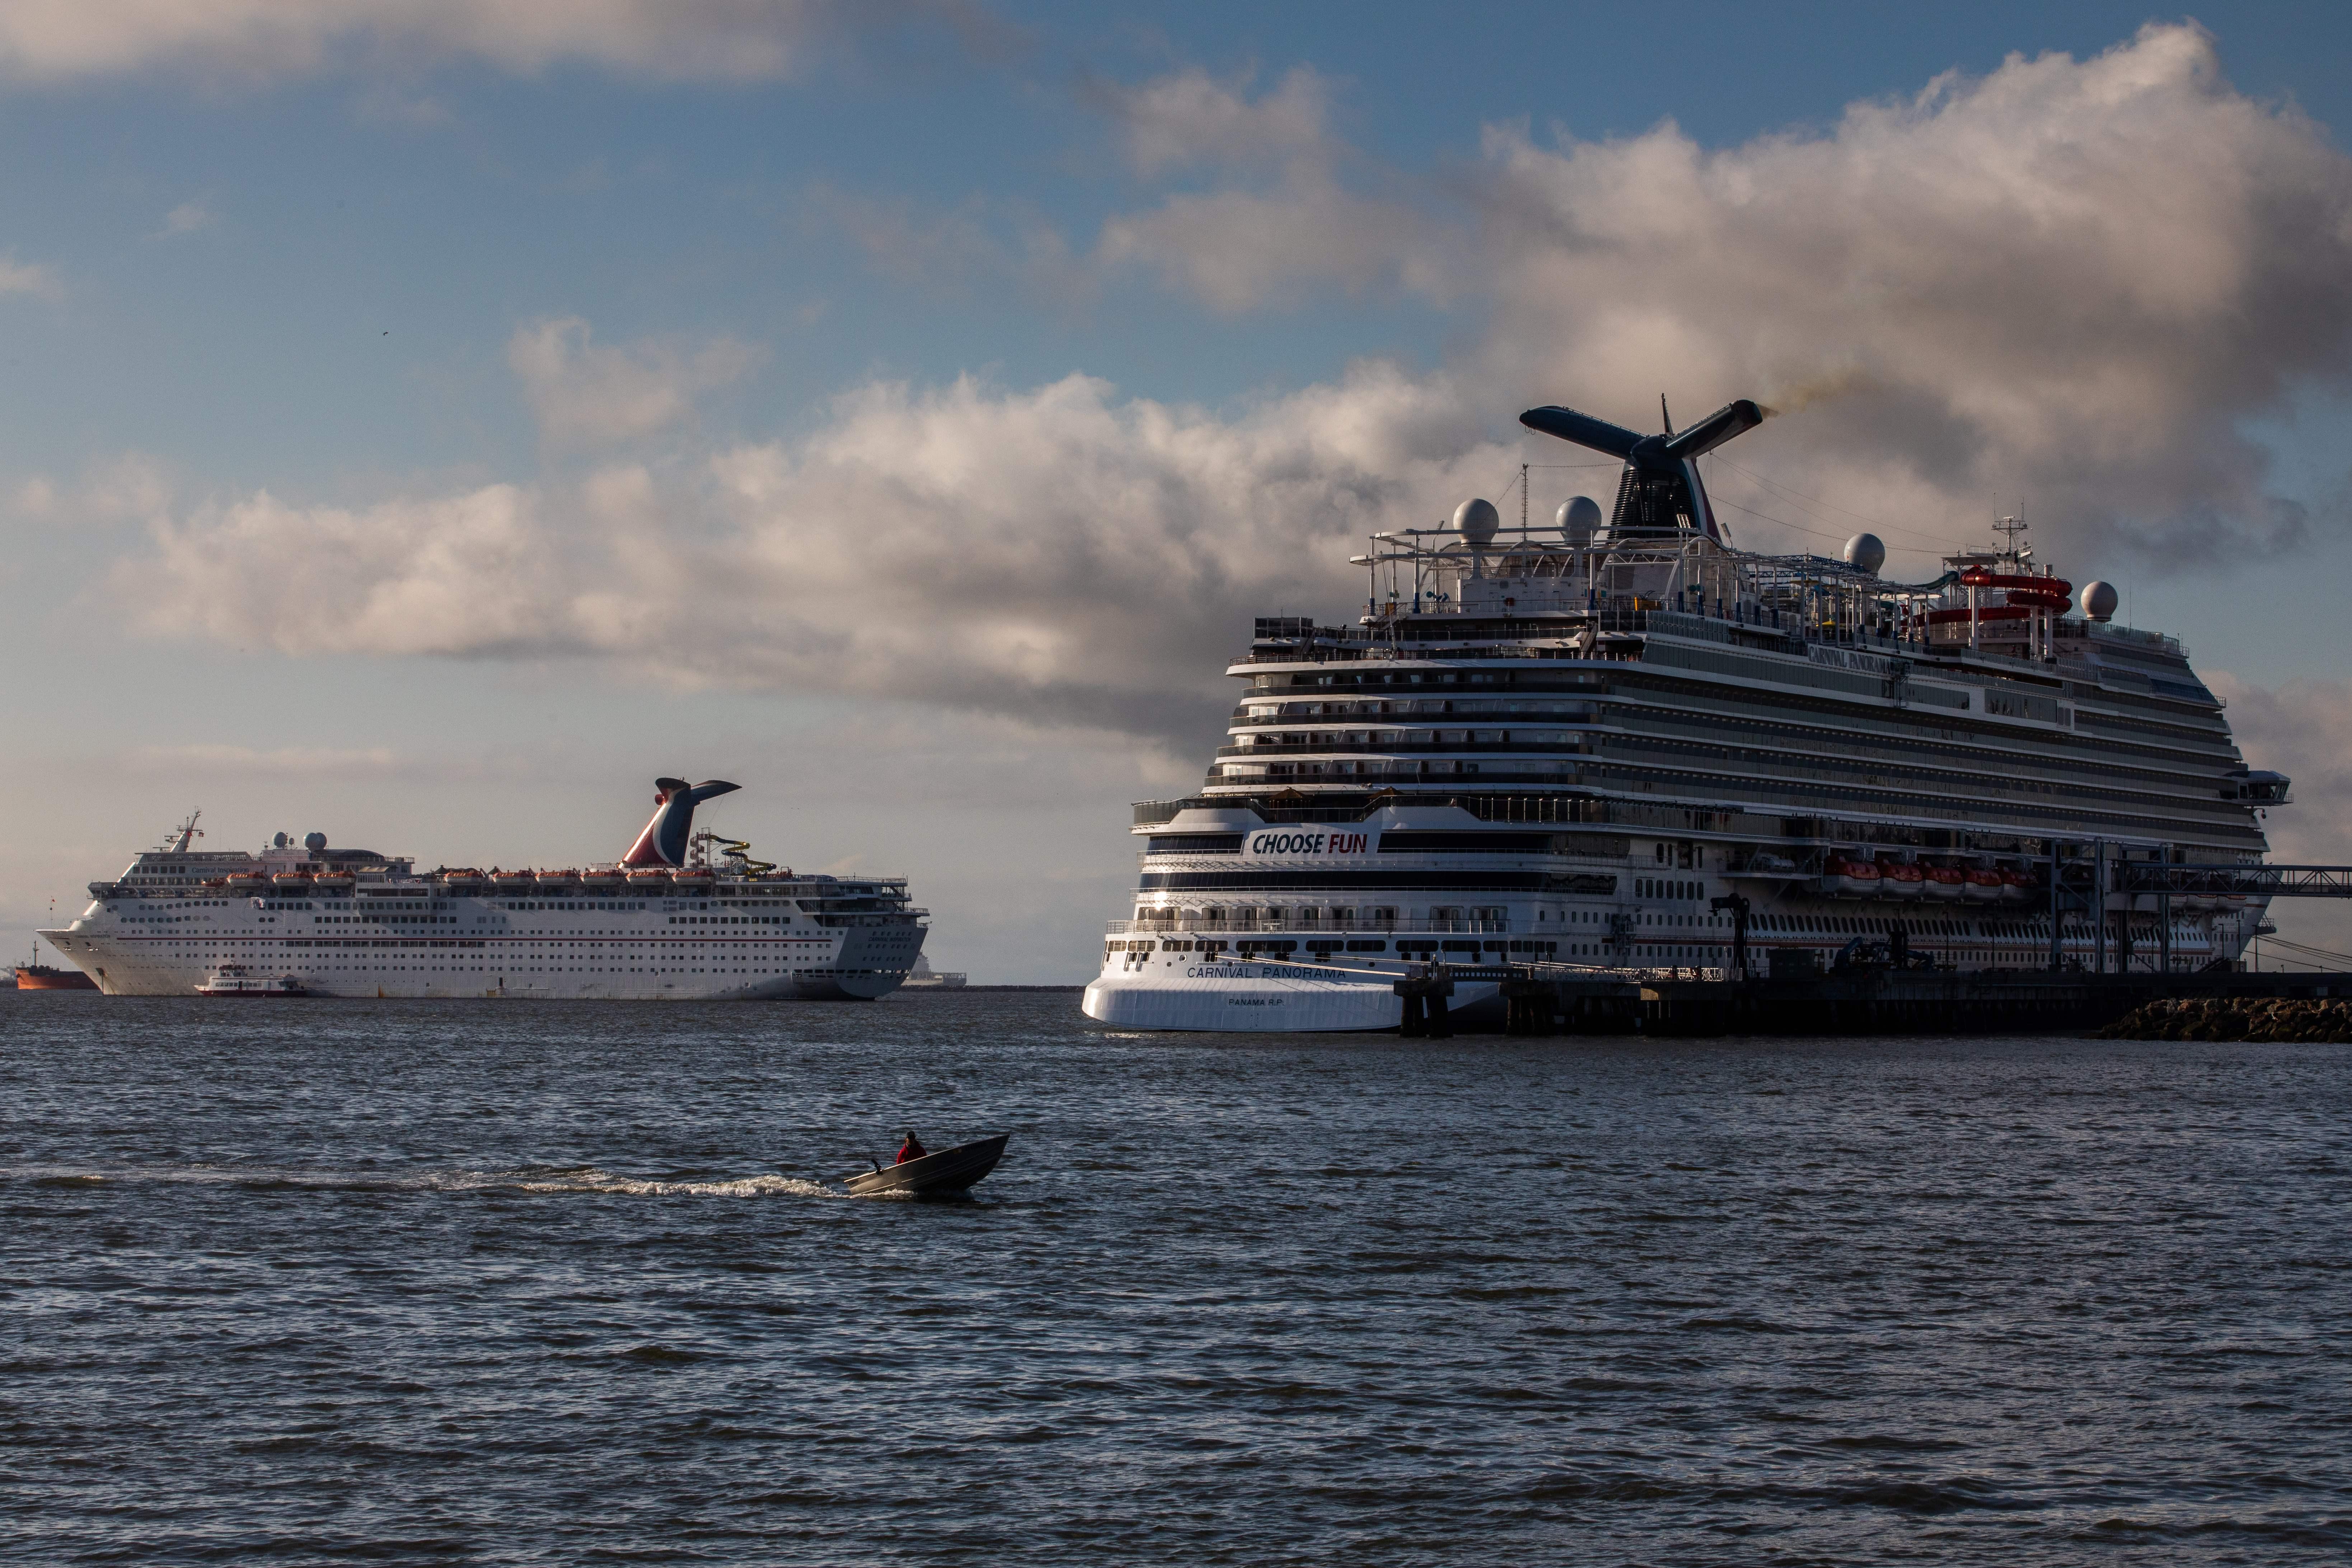 Over 80% of coronavirus patients on cruise ship had no symptoms, study says